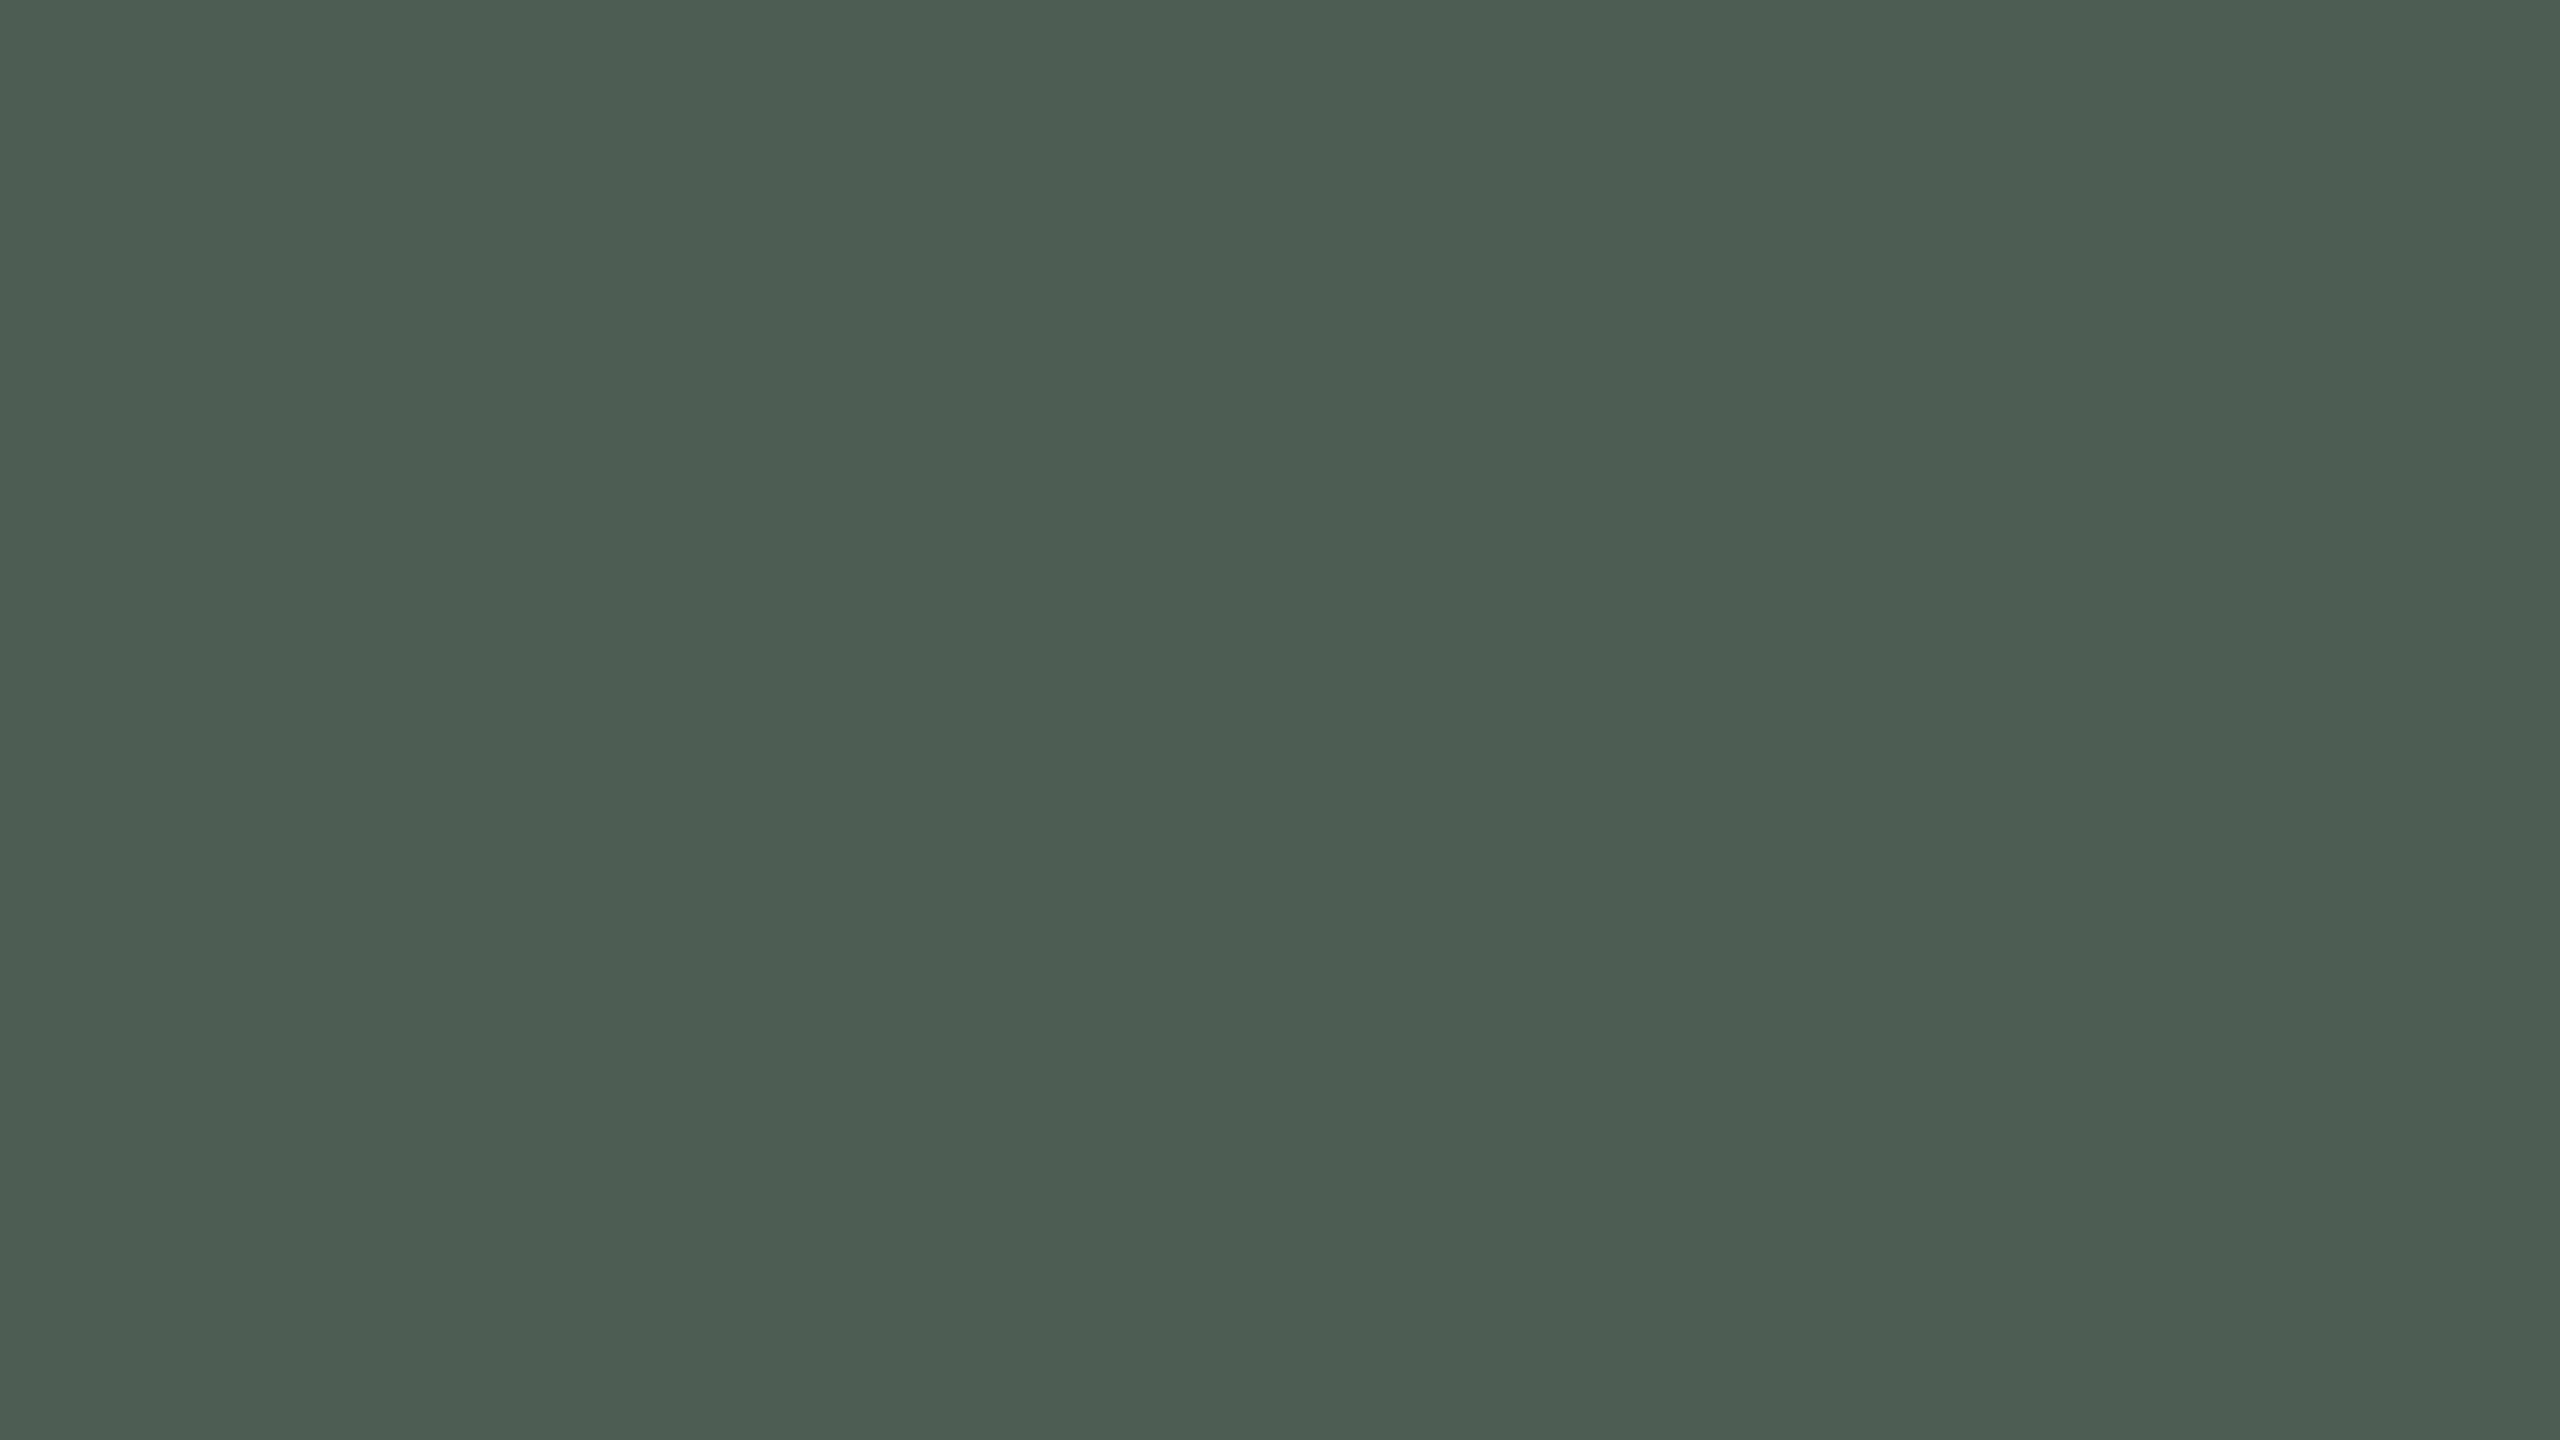 2560x1440 Feldgrau Solid Color Background